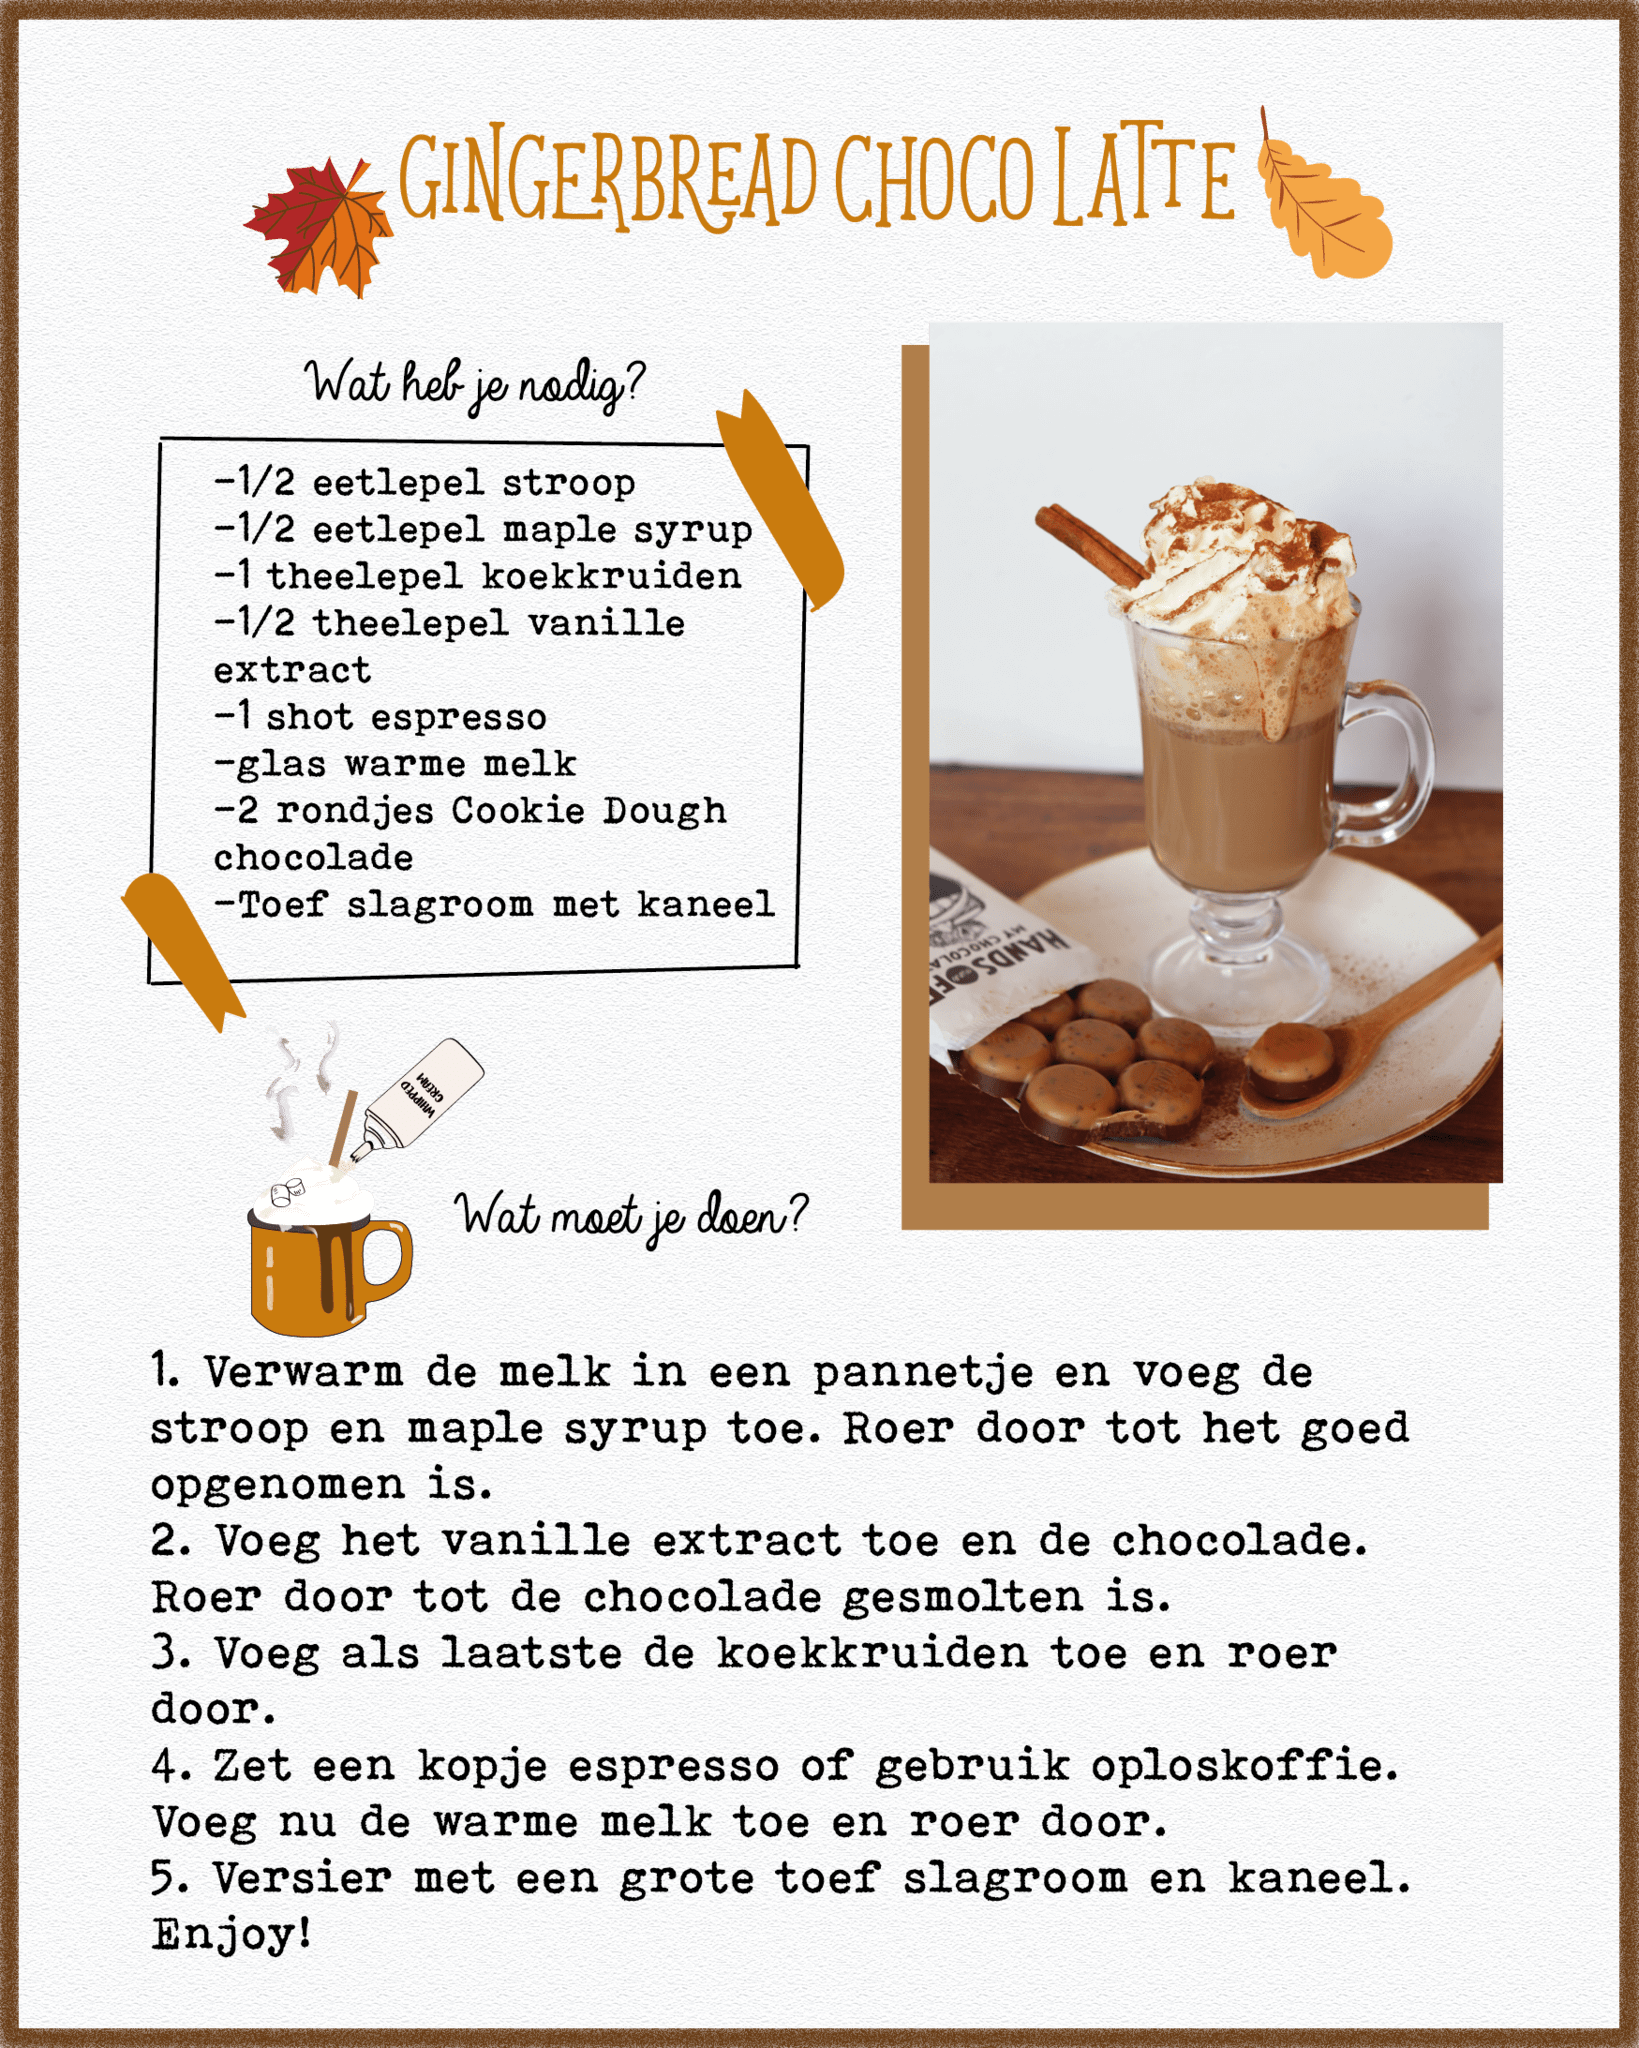 Gingerbread Choco Latte